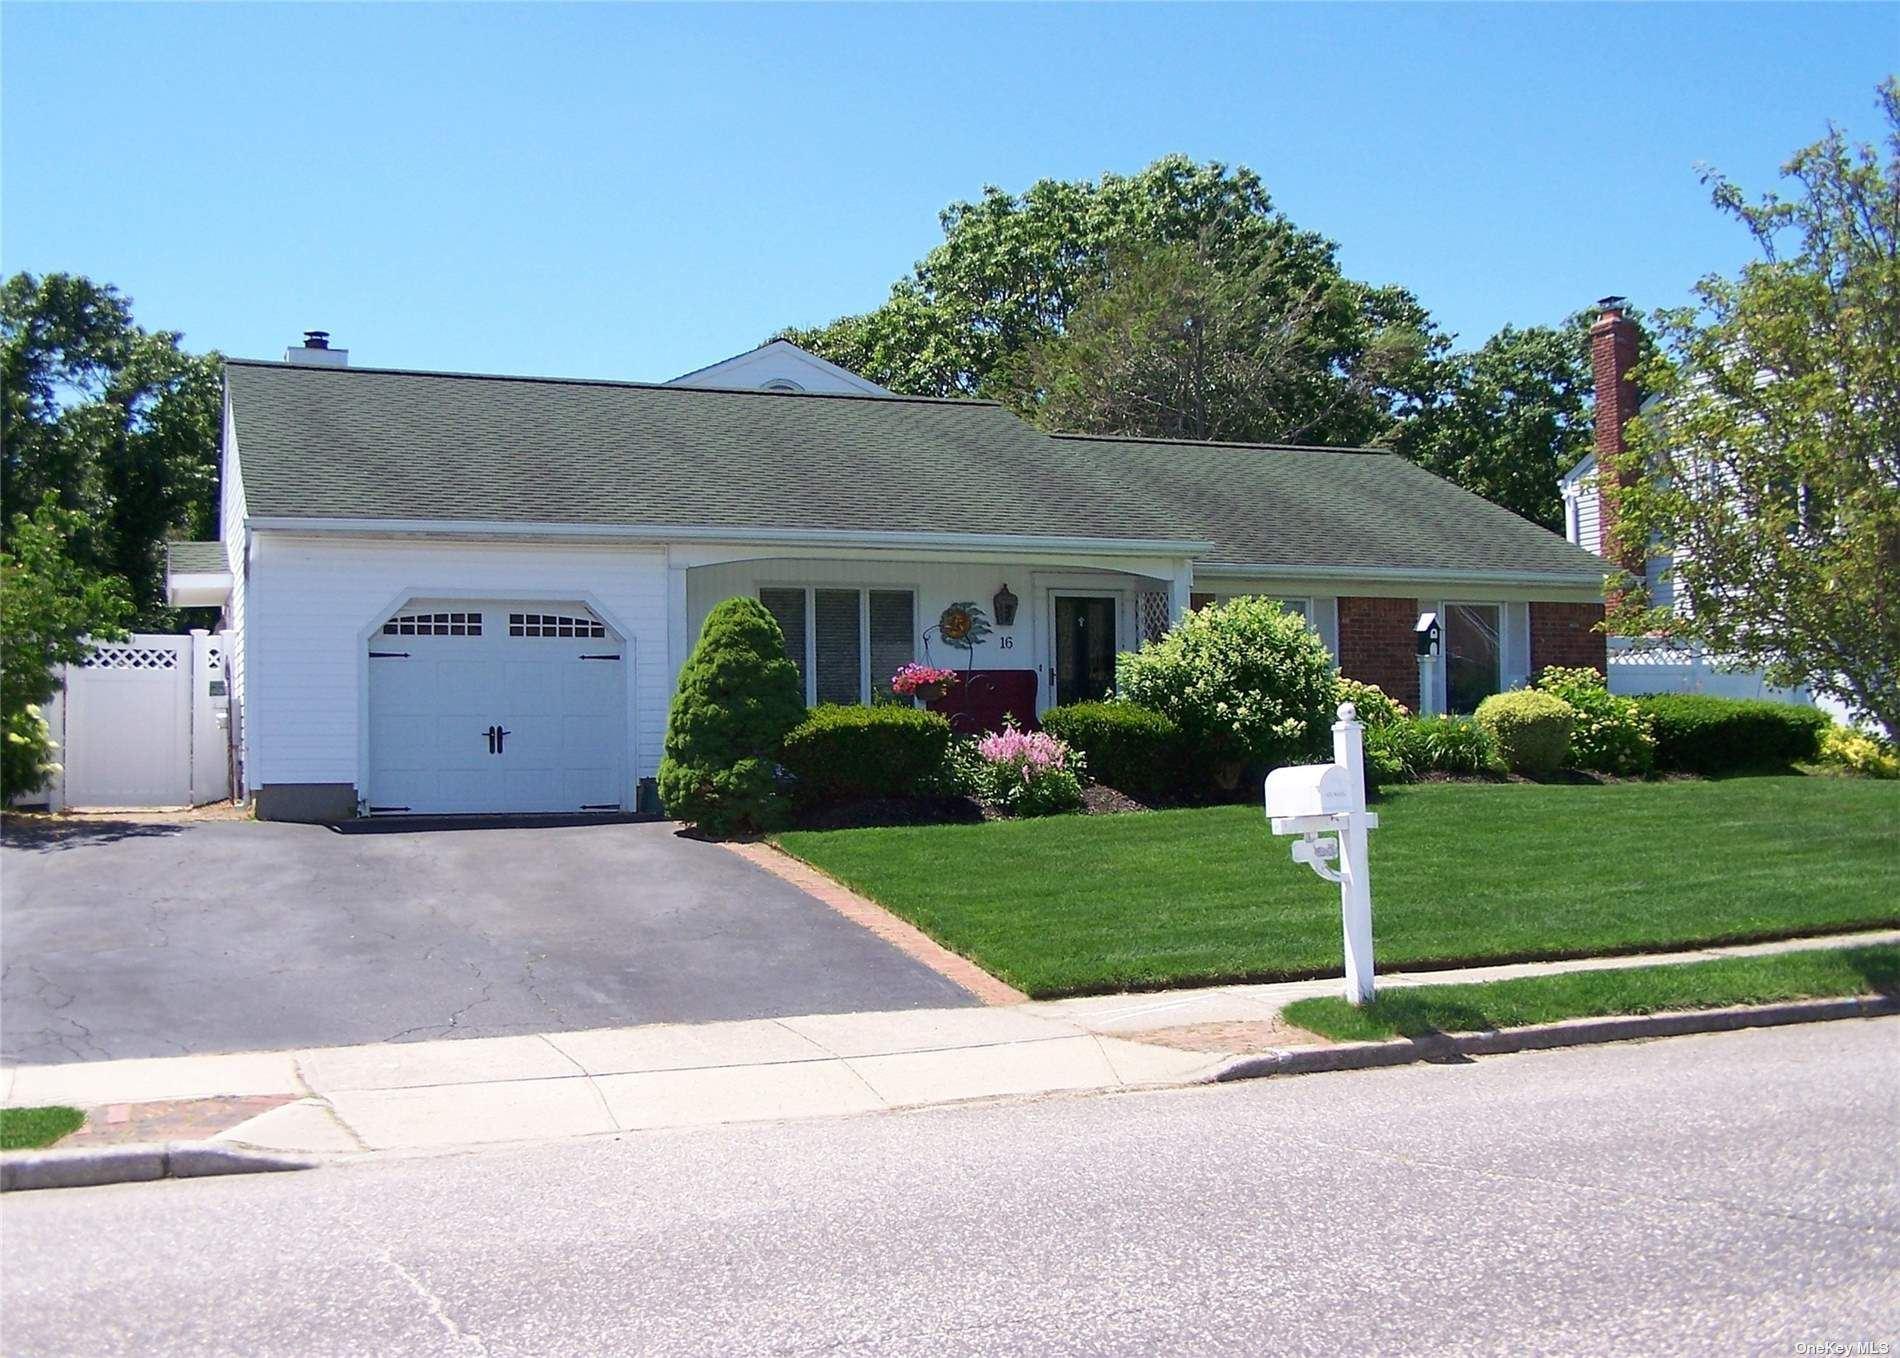 16 Singingwood Drive, Holbrook, NY 11741 - MLS#: 3350231